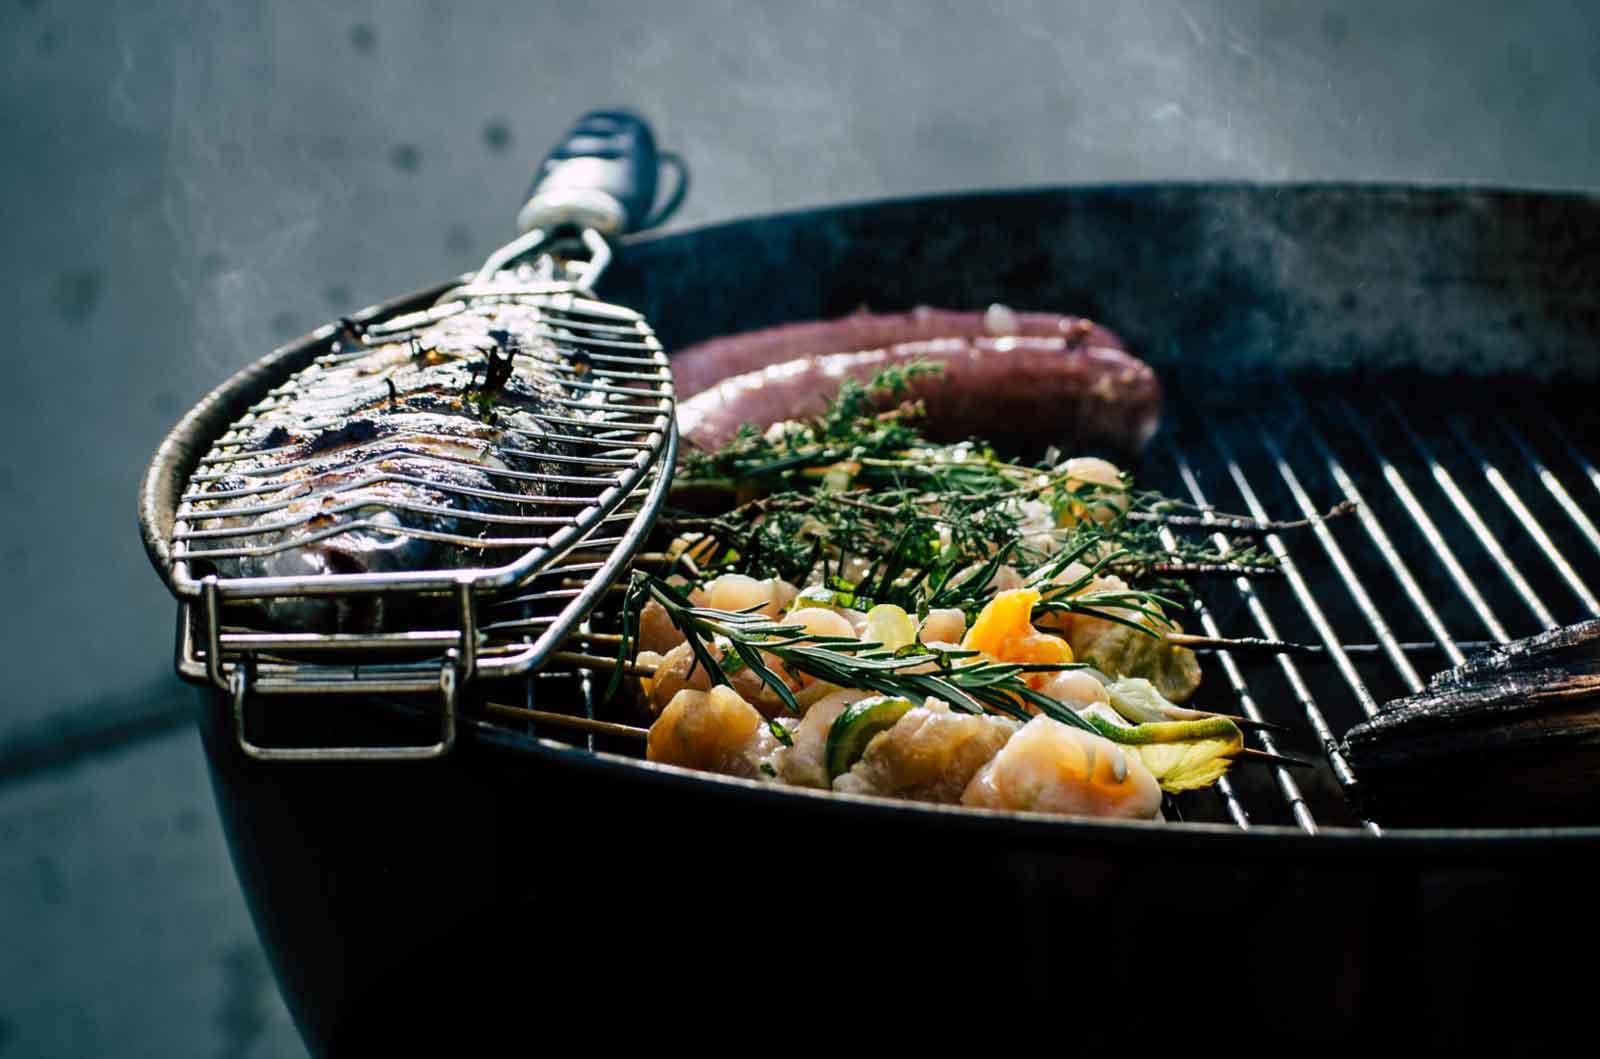 TEAMBRENNER International leichtes Sommerrezept Gegrillter Fisch gekochten Kartoffeln Salat